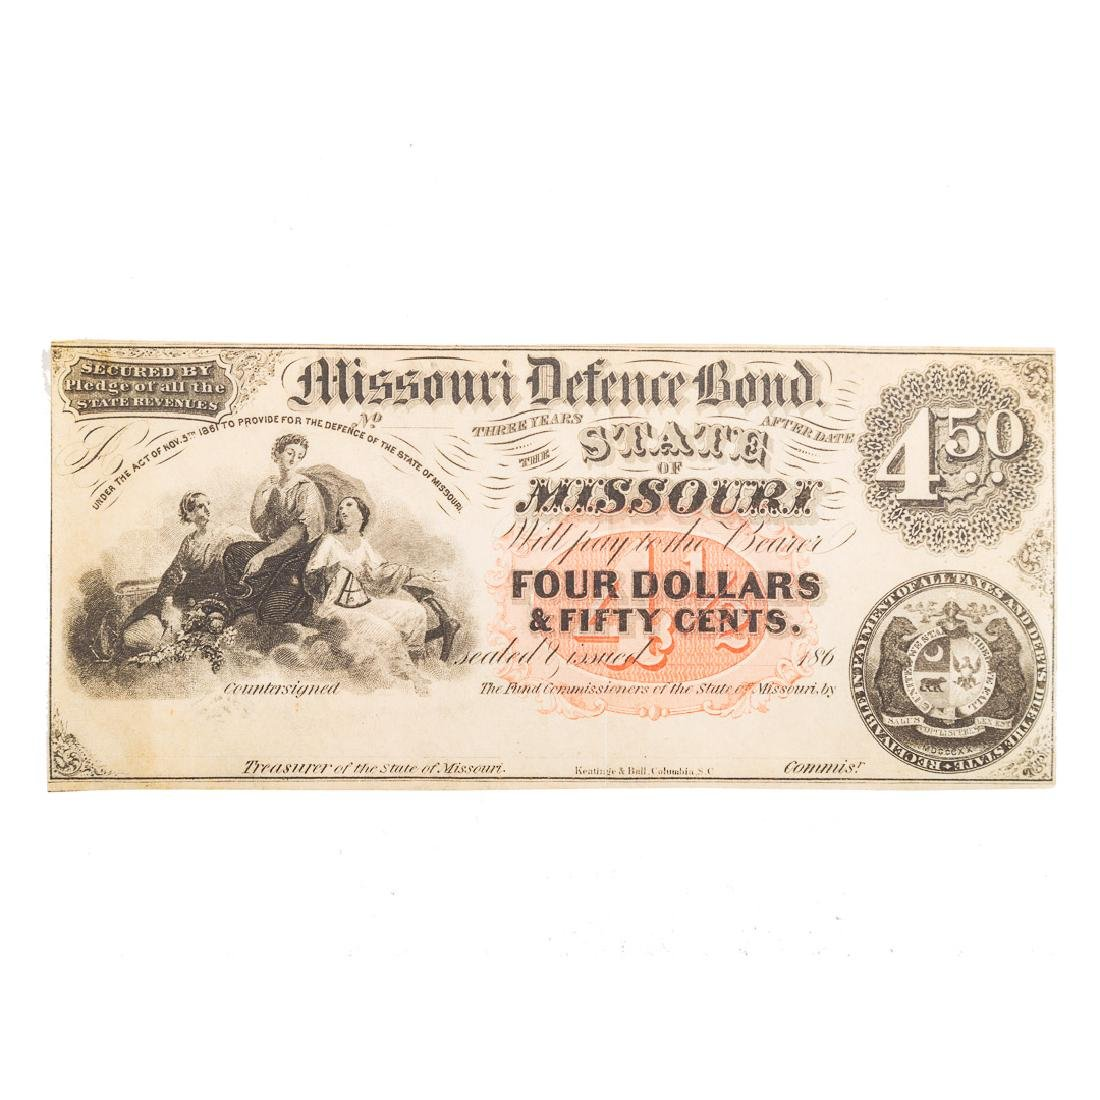 [US] Missouri Defence Bond $4.50 Remainder